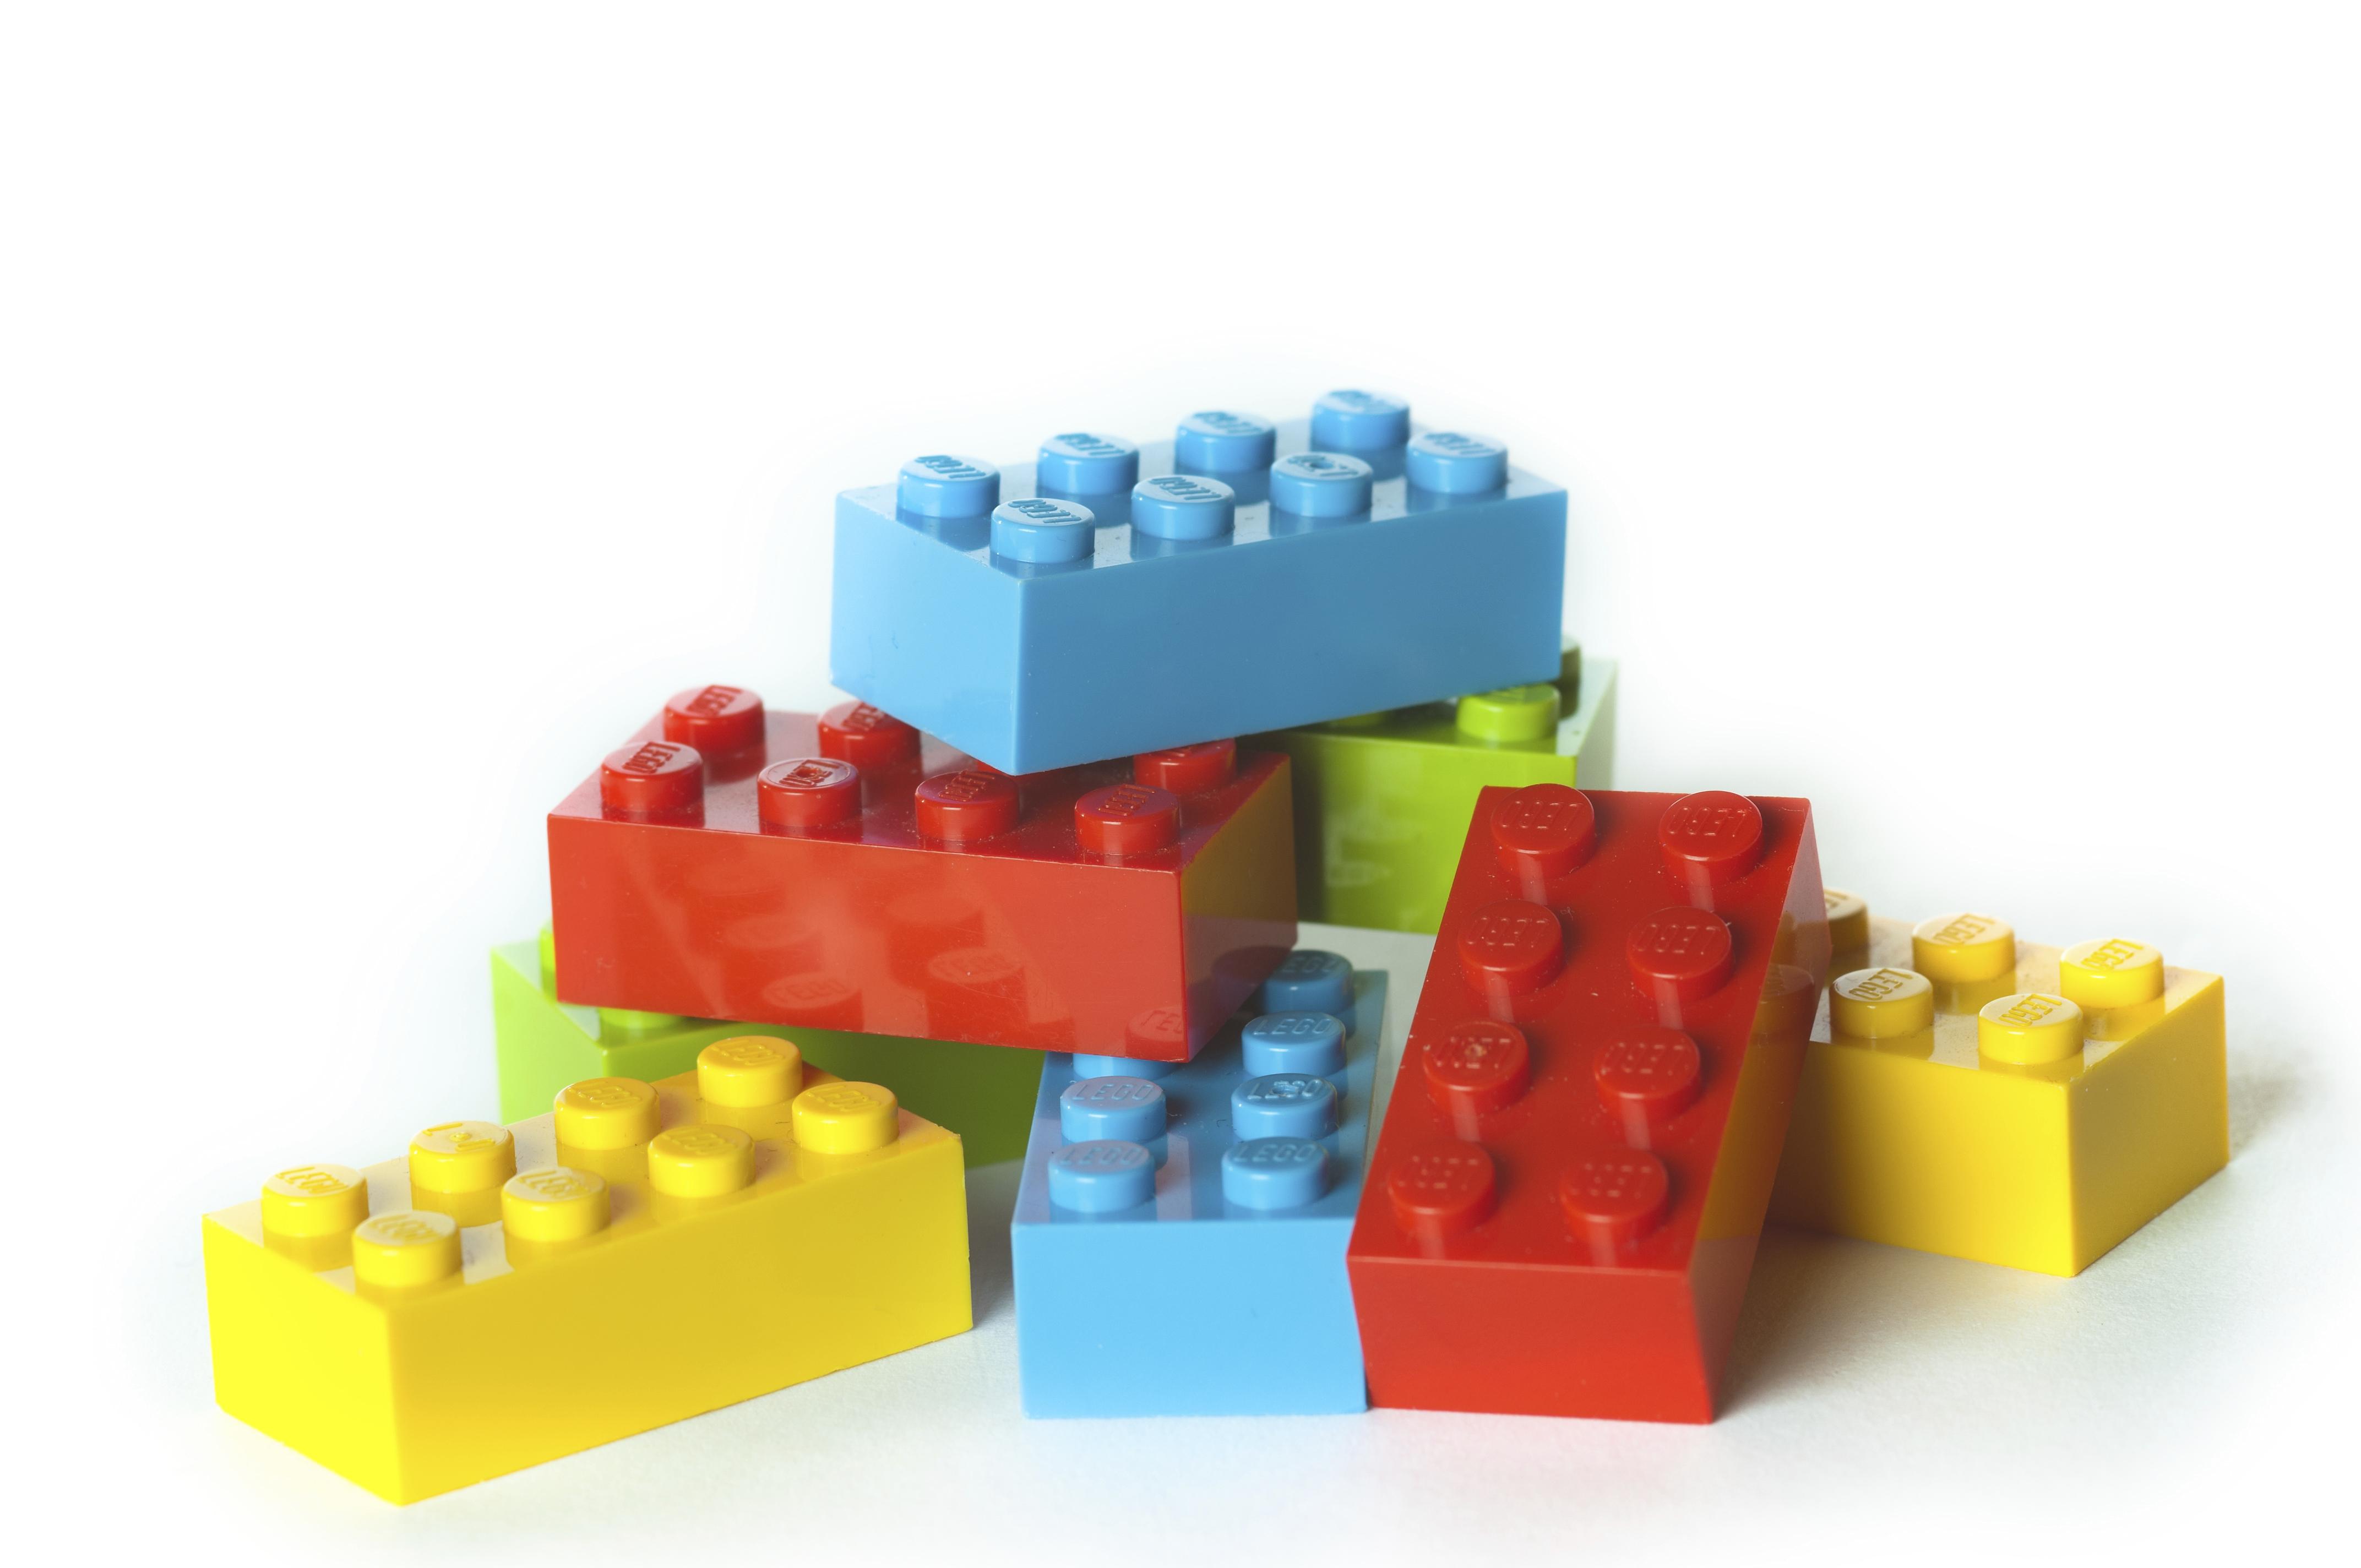 YOU BUILD IT! NEXTRIO LEGO® BRICK PLAYROOM - Tucson Botanical Garden